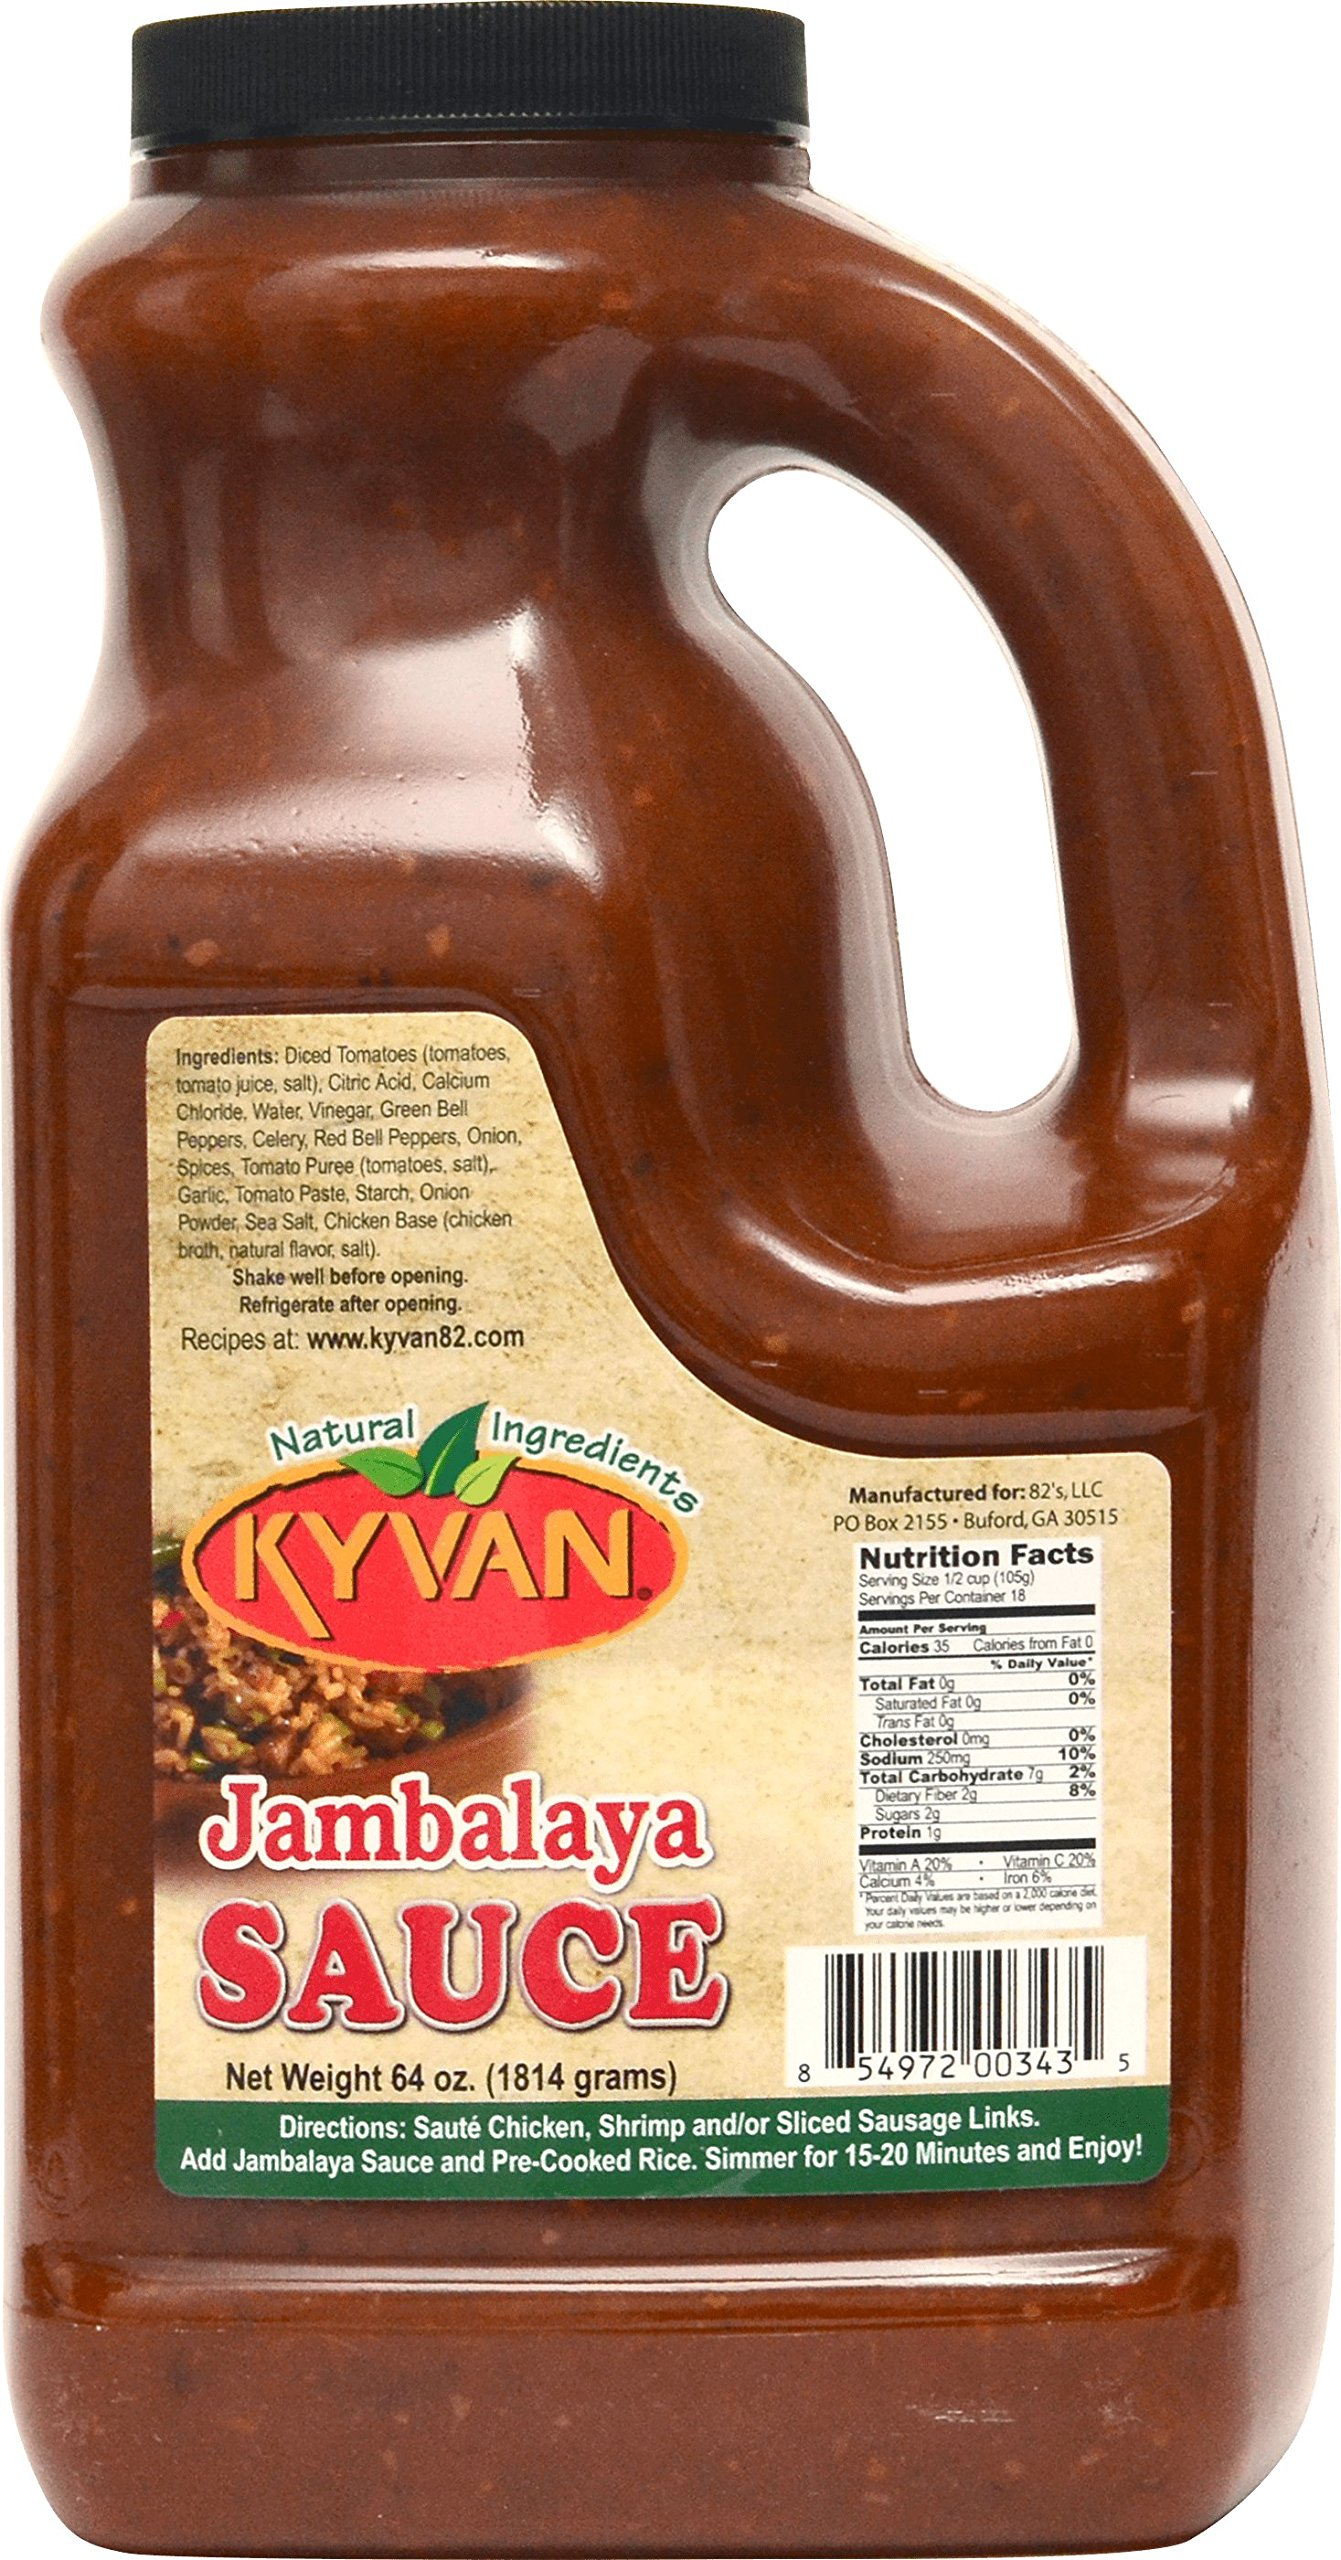 KYVAN Jambalaya Sauce